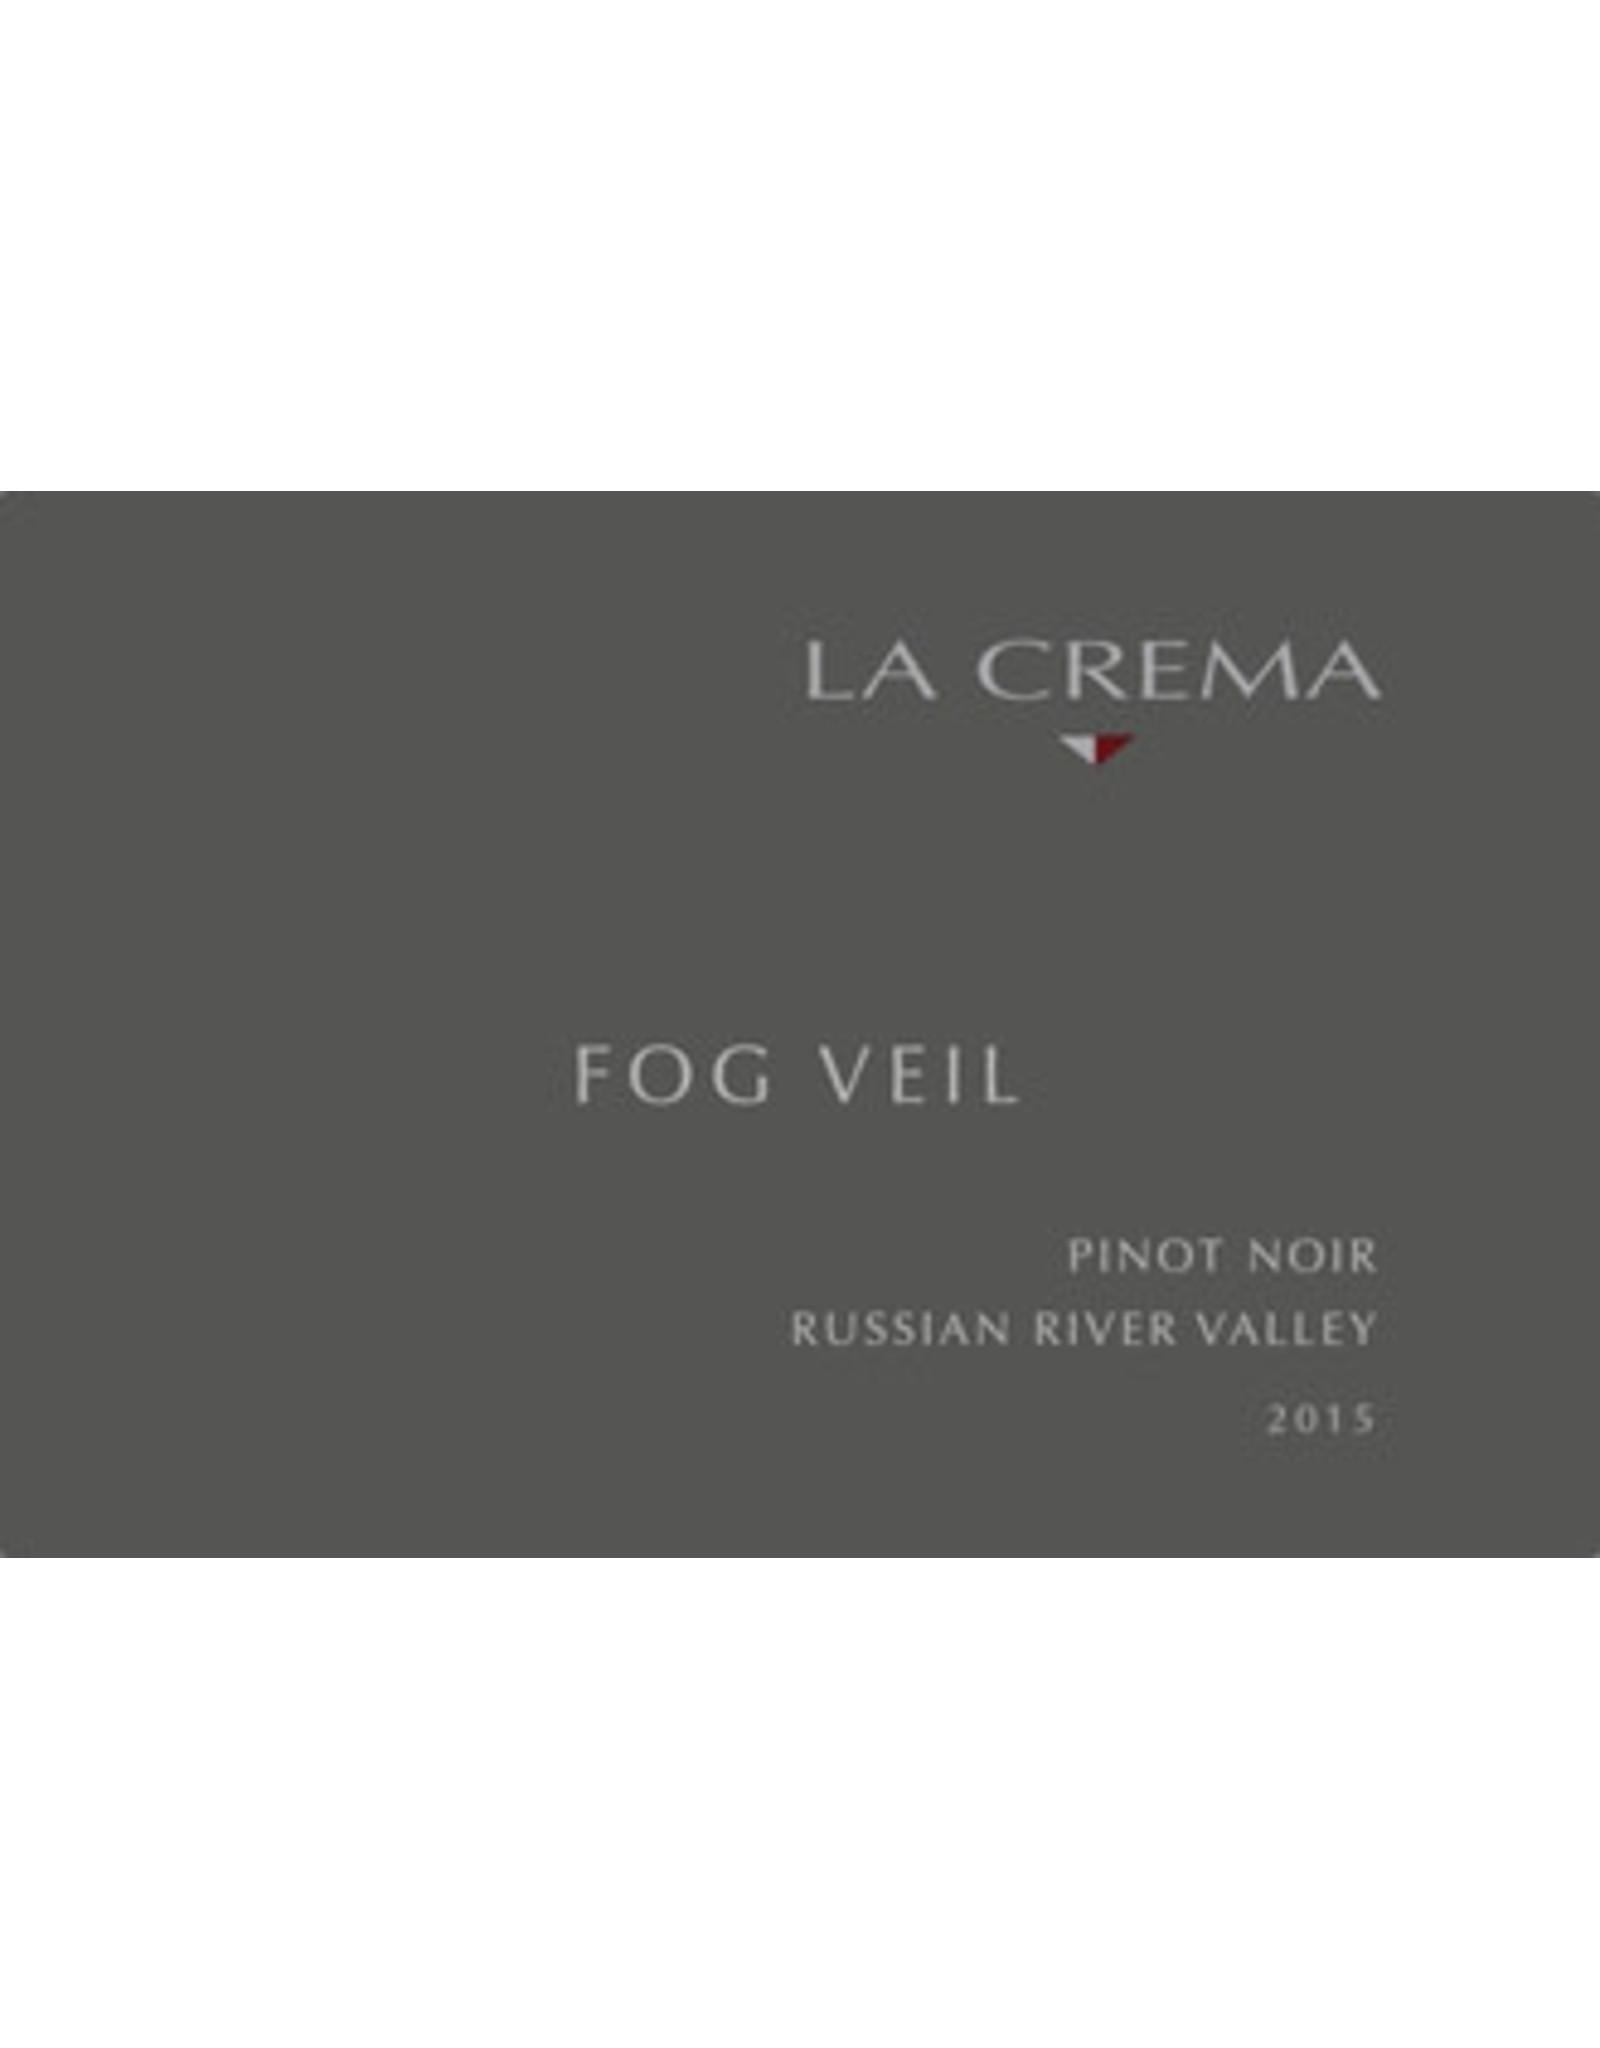 Pinot Noir La Crema Fog Veil Vineyards Pinot Noir RRV 16